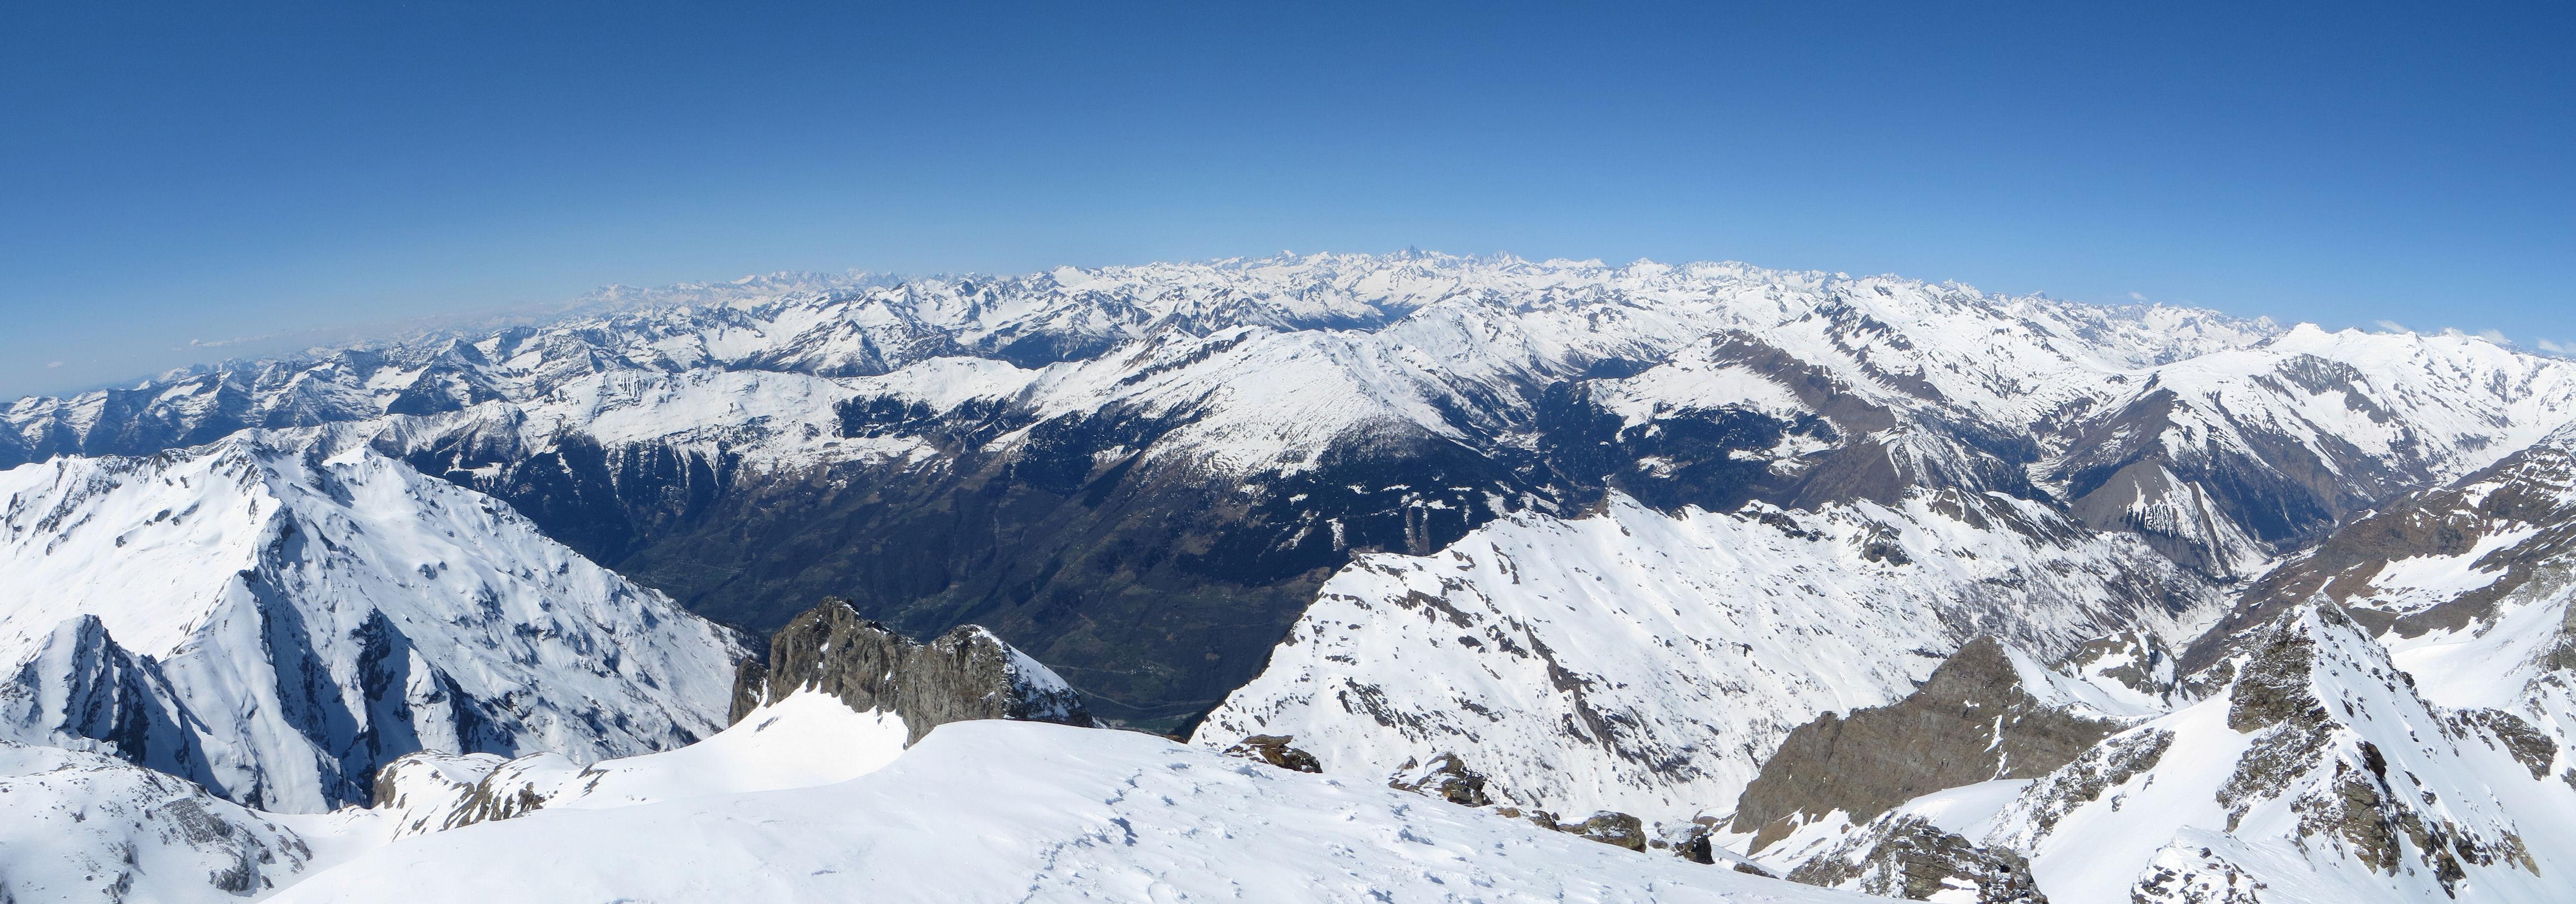 1600-STA_5436 Panorama